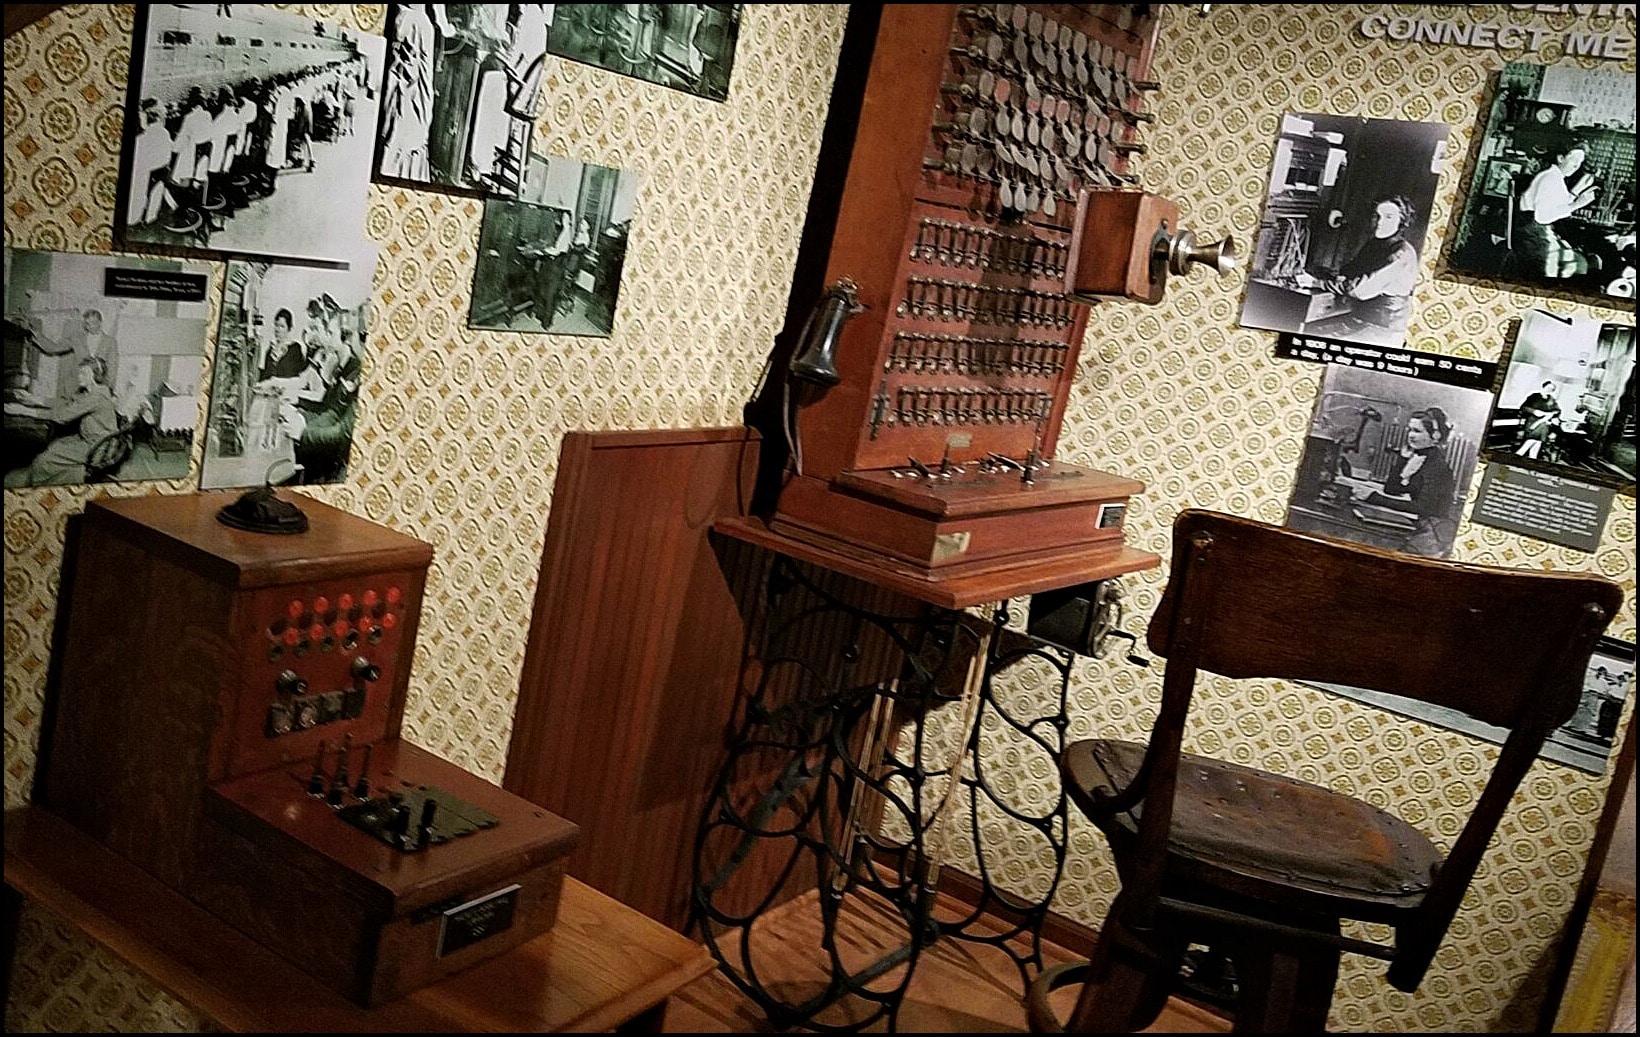 Kansas dickinson county abilene - History Of The Telephone